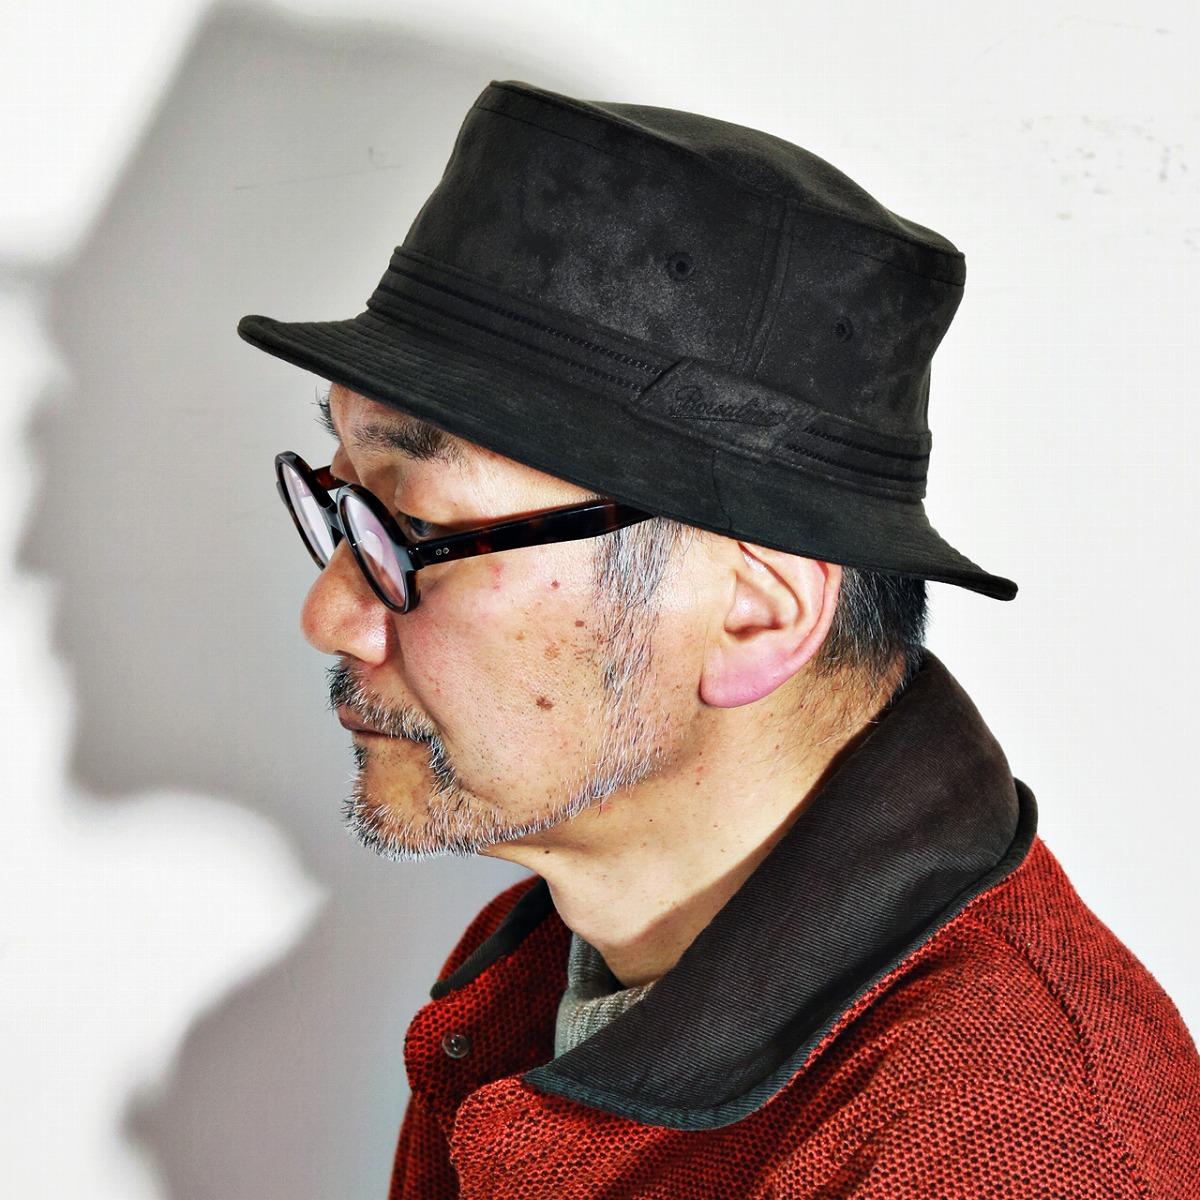 20e061a2a1e Borsalino (borsalino) selling TCM HAT charcoal grey (large size outdoor  fall for fall winter merchandise Hat CAP and Safari Hat presents outdoor  Safari ...